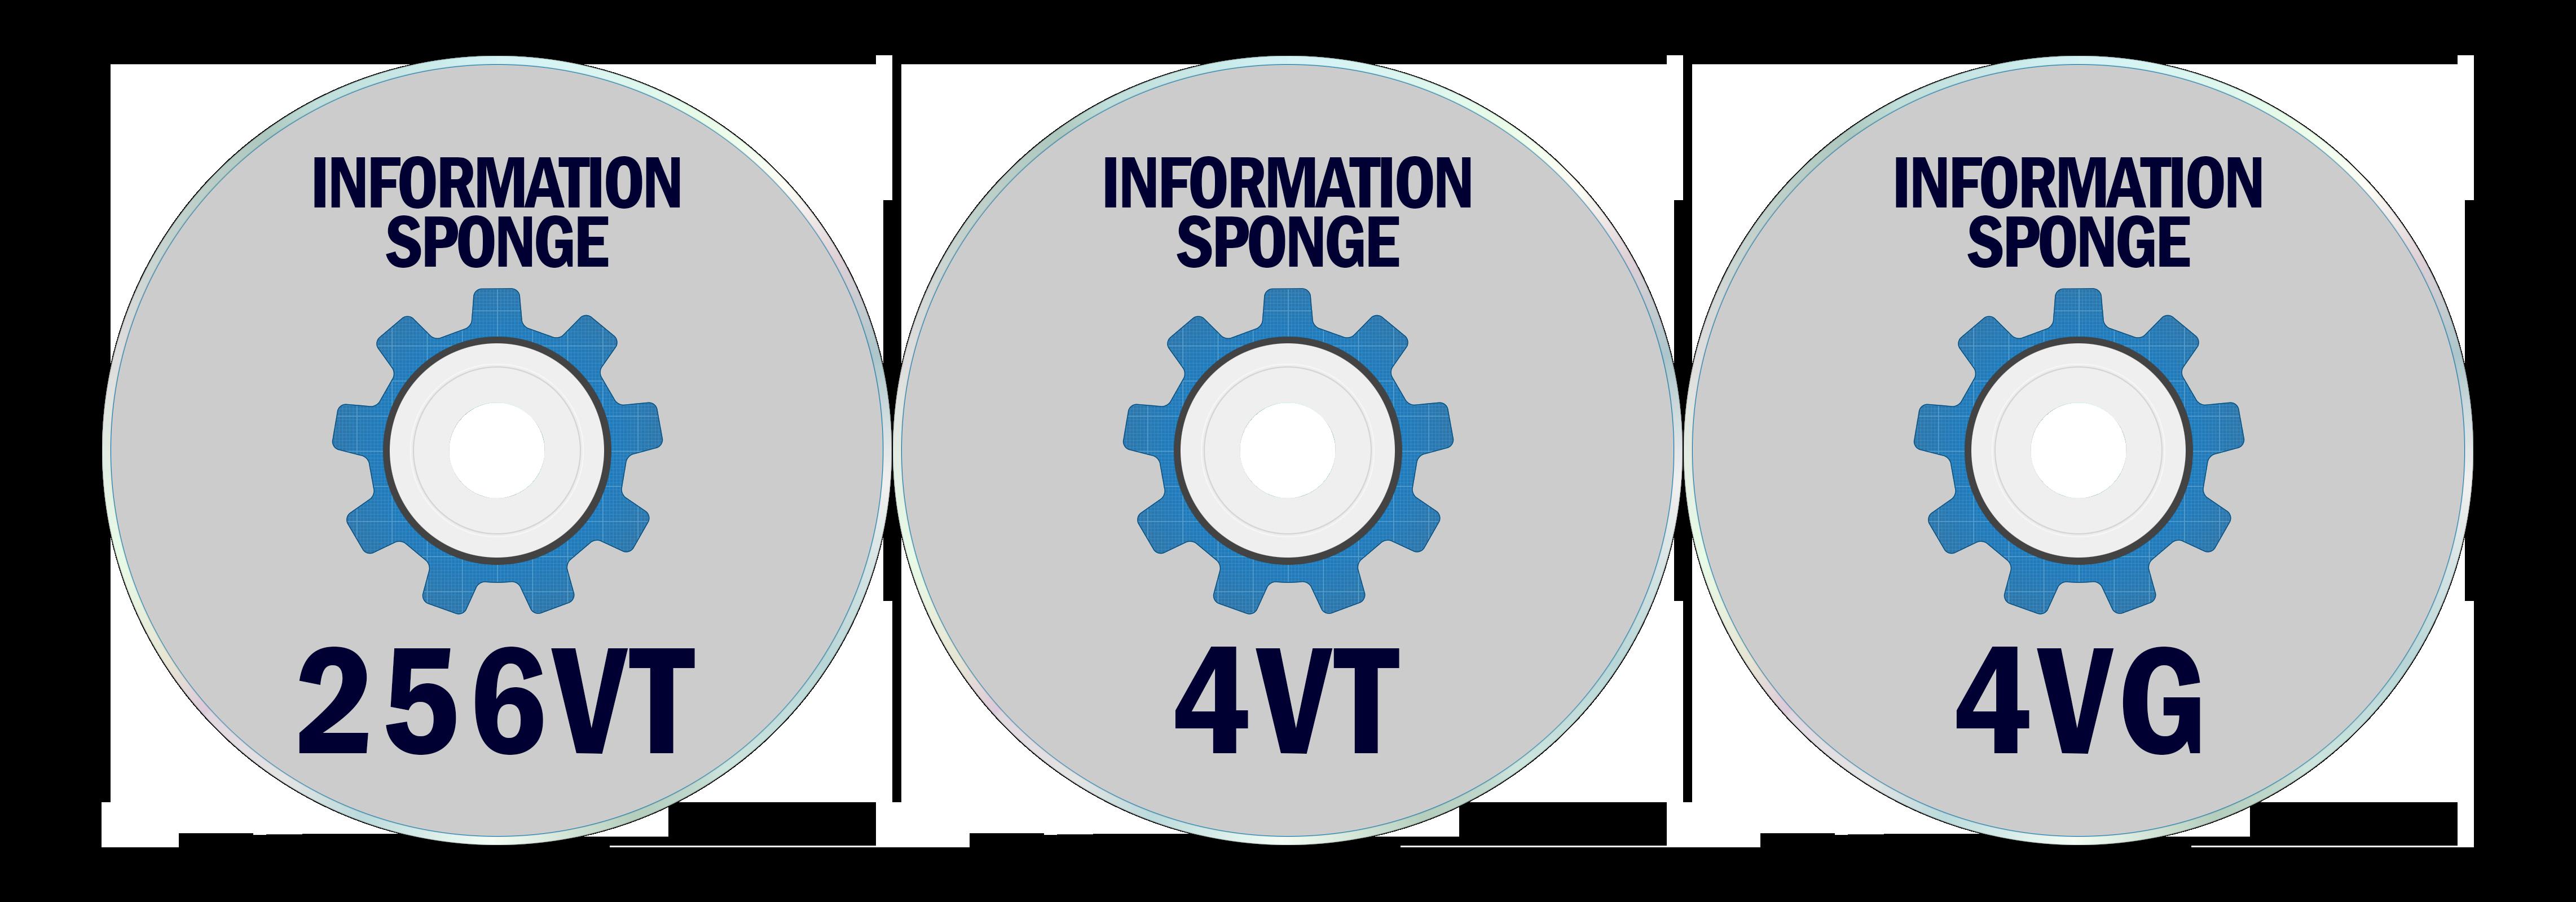 Info Sponge